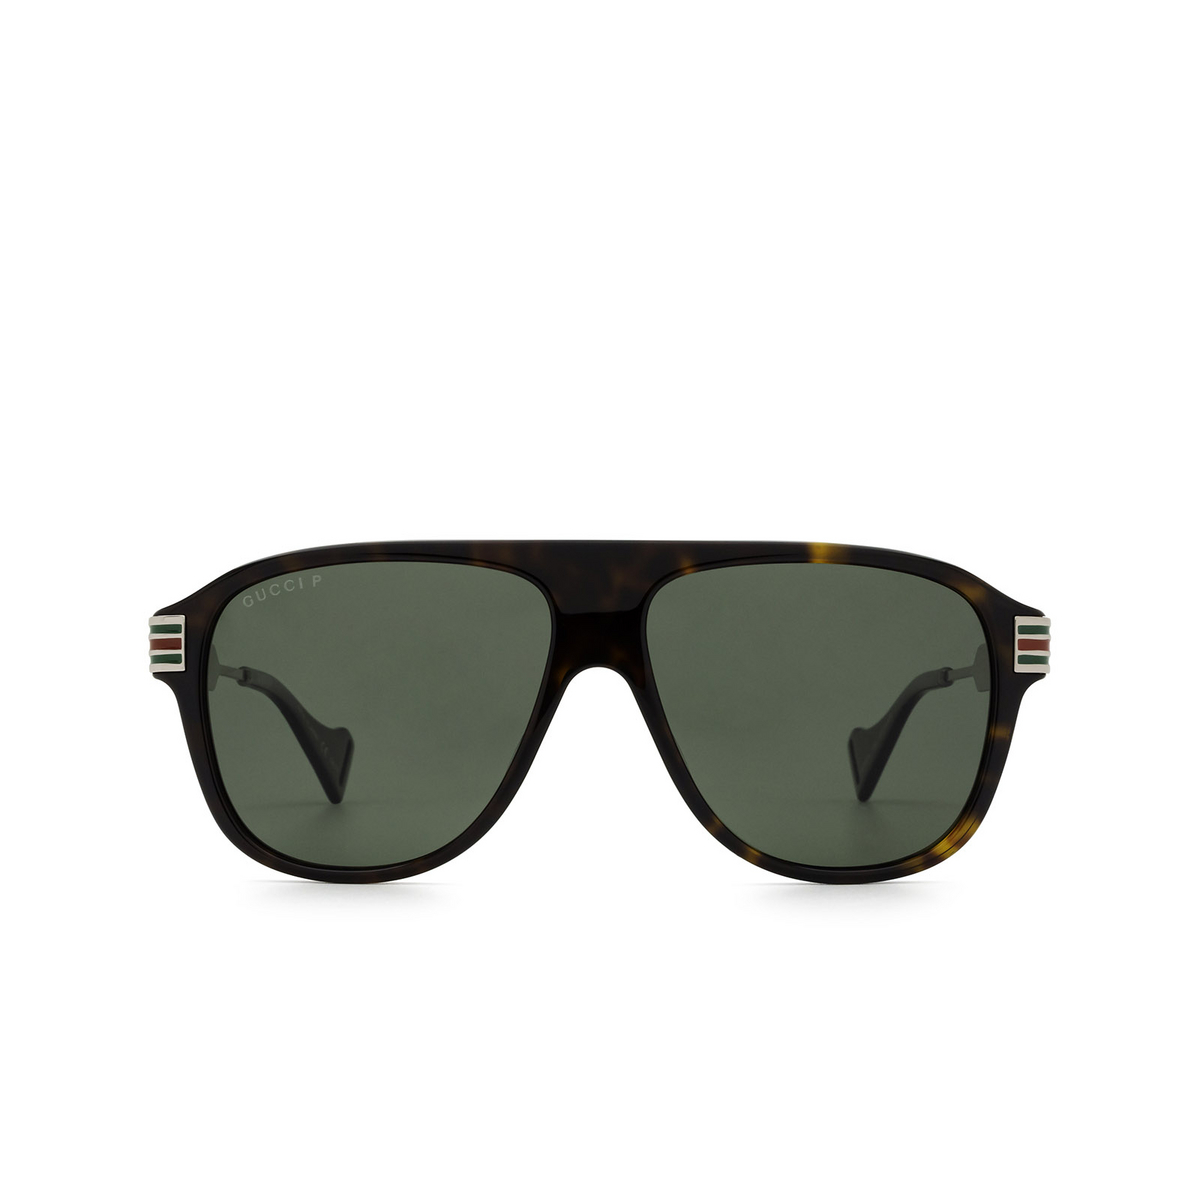 Gucci® Aviator Sunglasses: GG0587S color Havana 002 - 1/3.